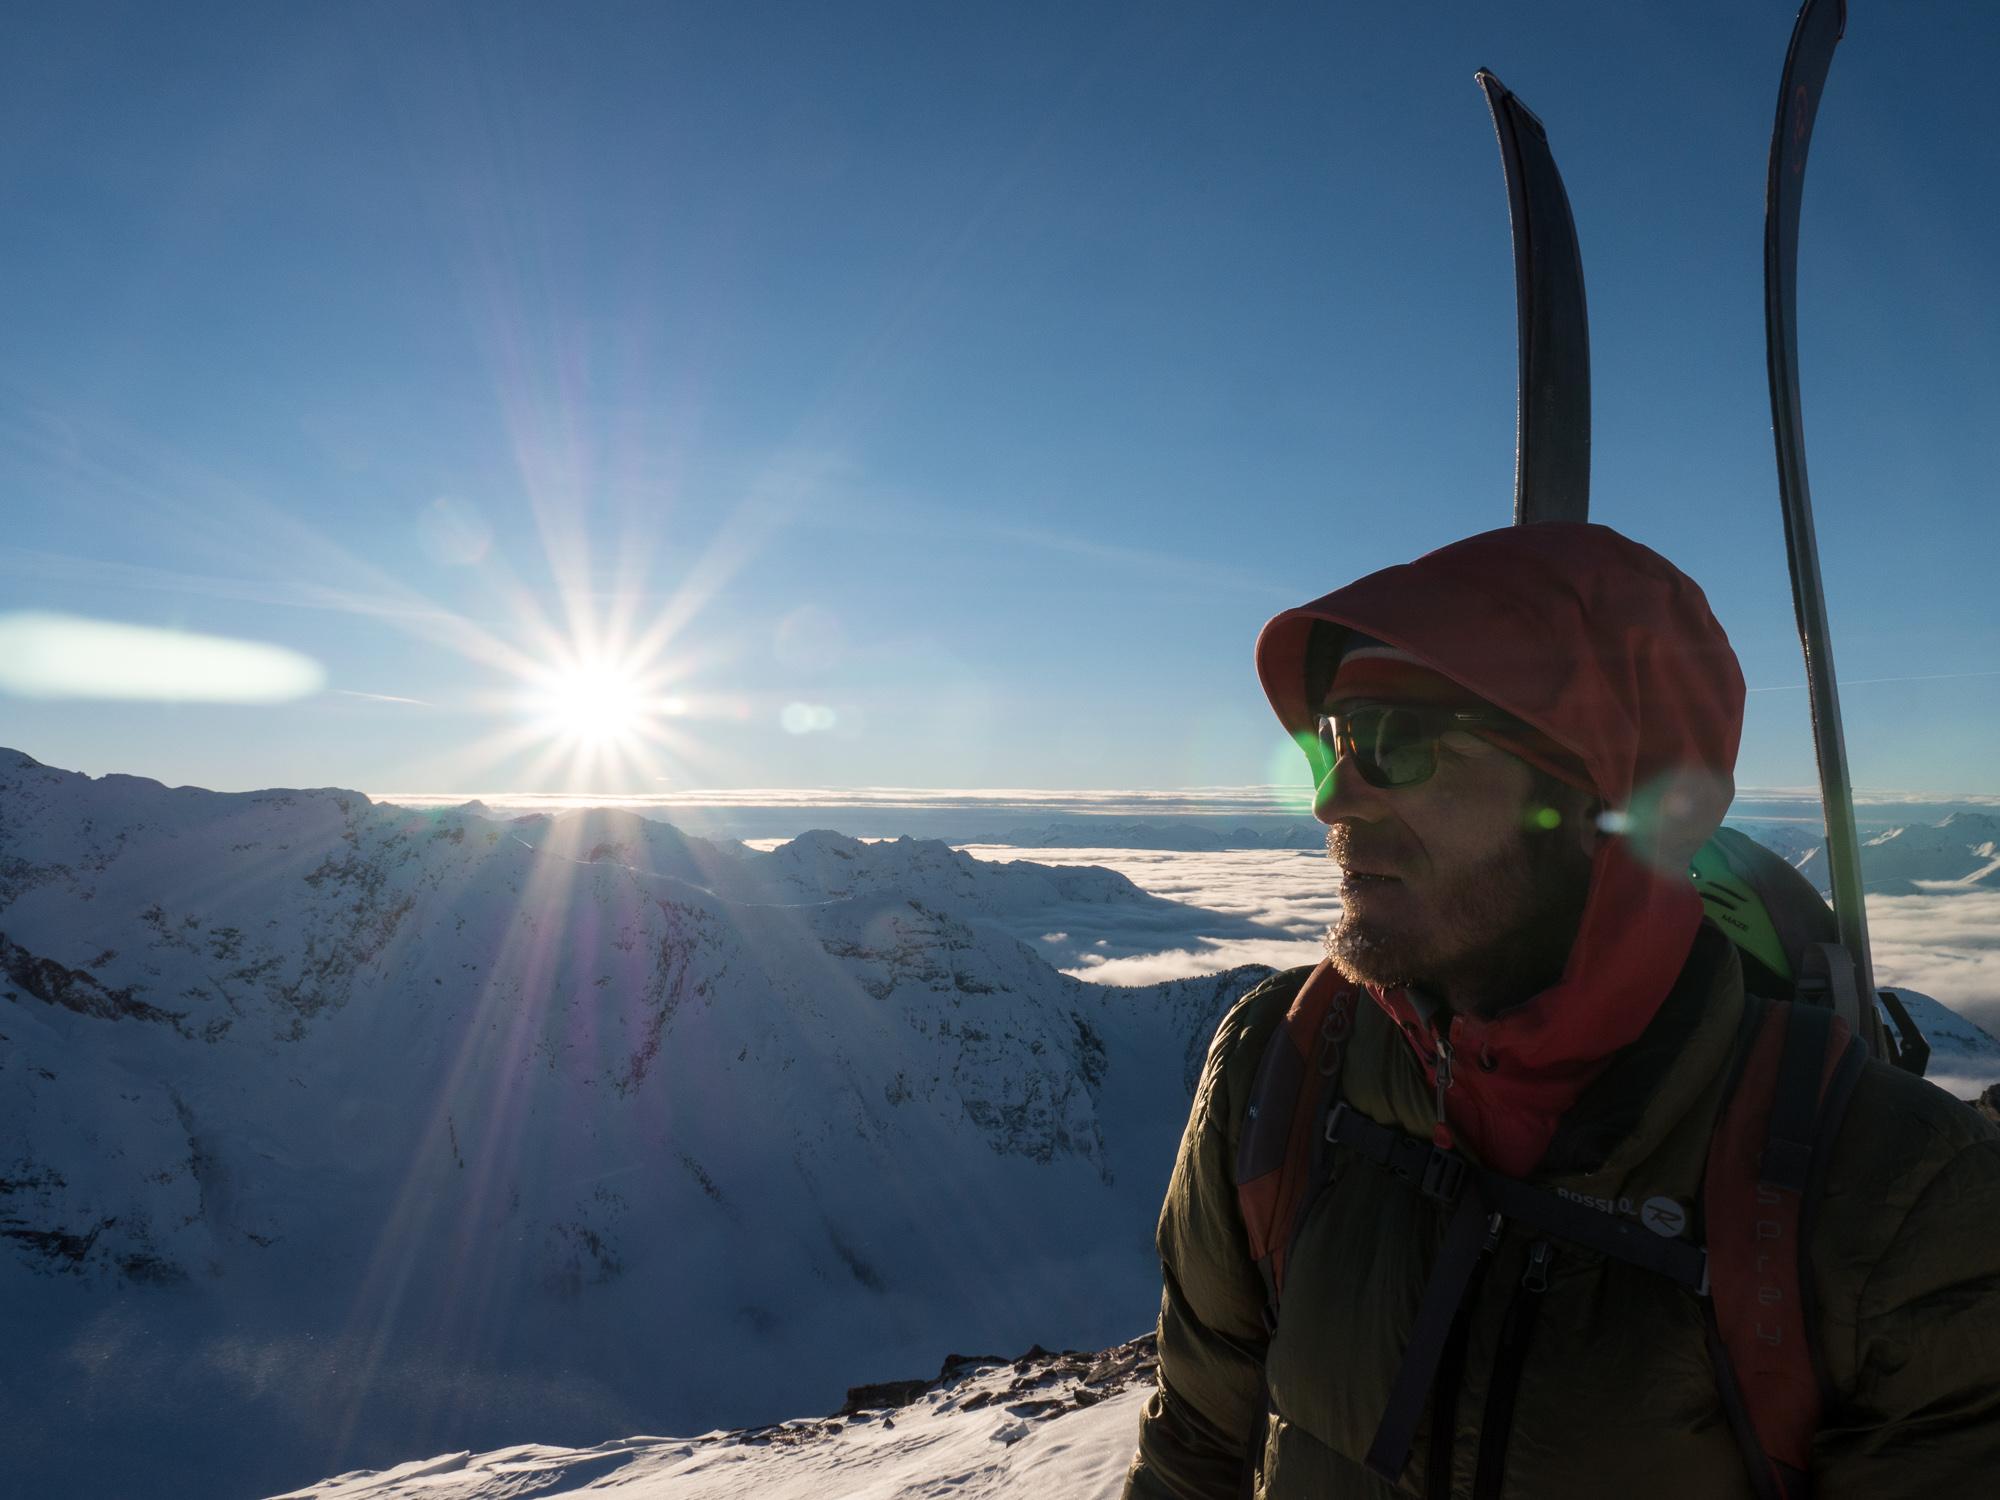 Maciej cloudscape profile